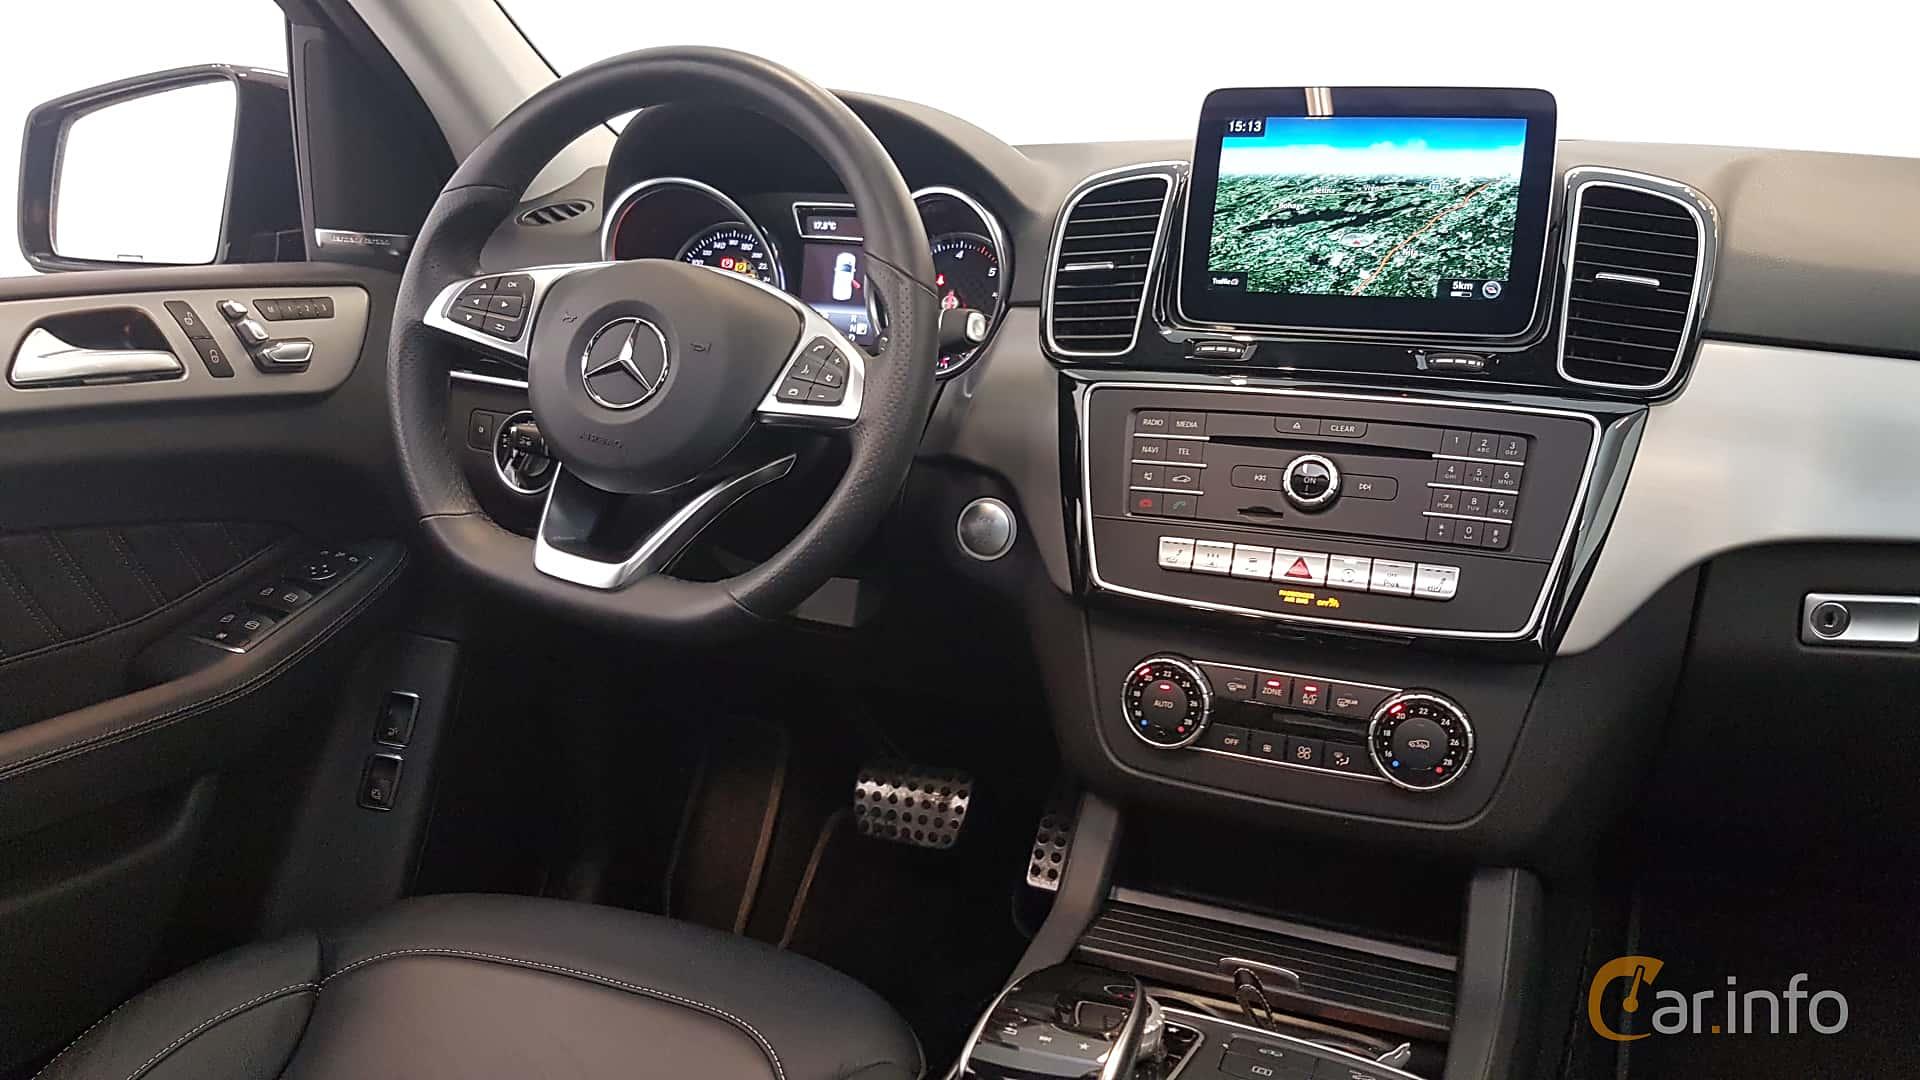 Mercedes-Benz GLE 350 d 4MATIC  9G-Tronic, 258hp, 2018